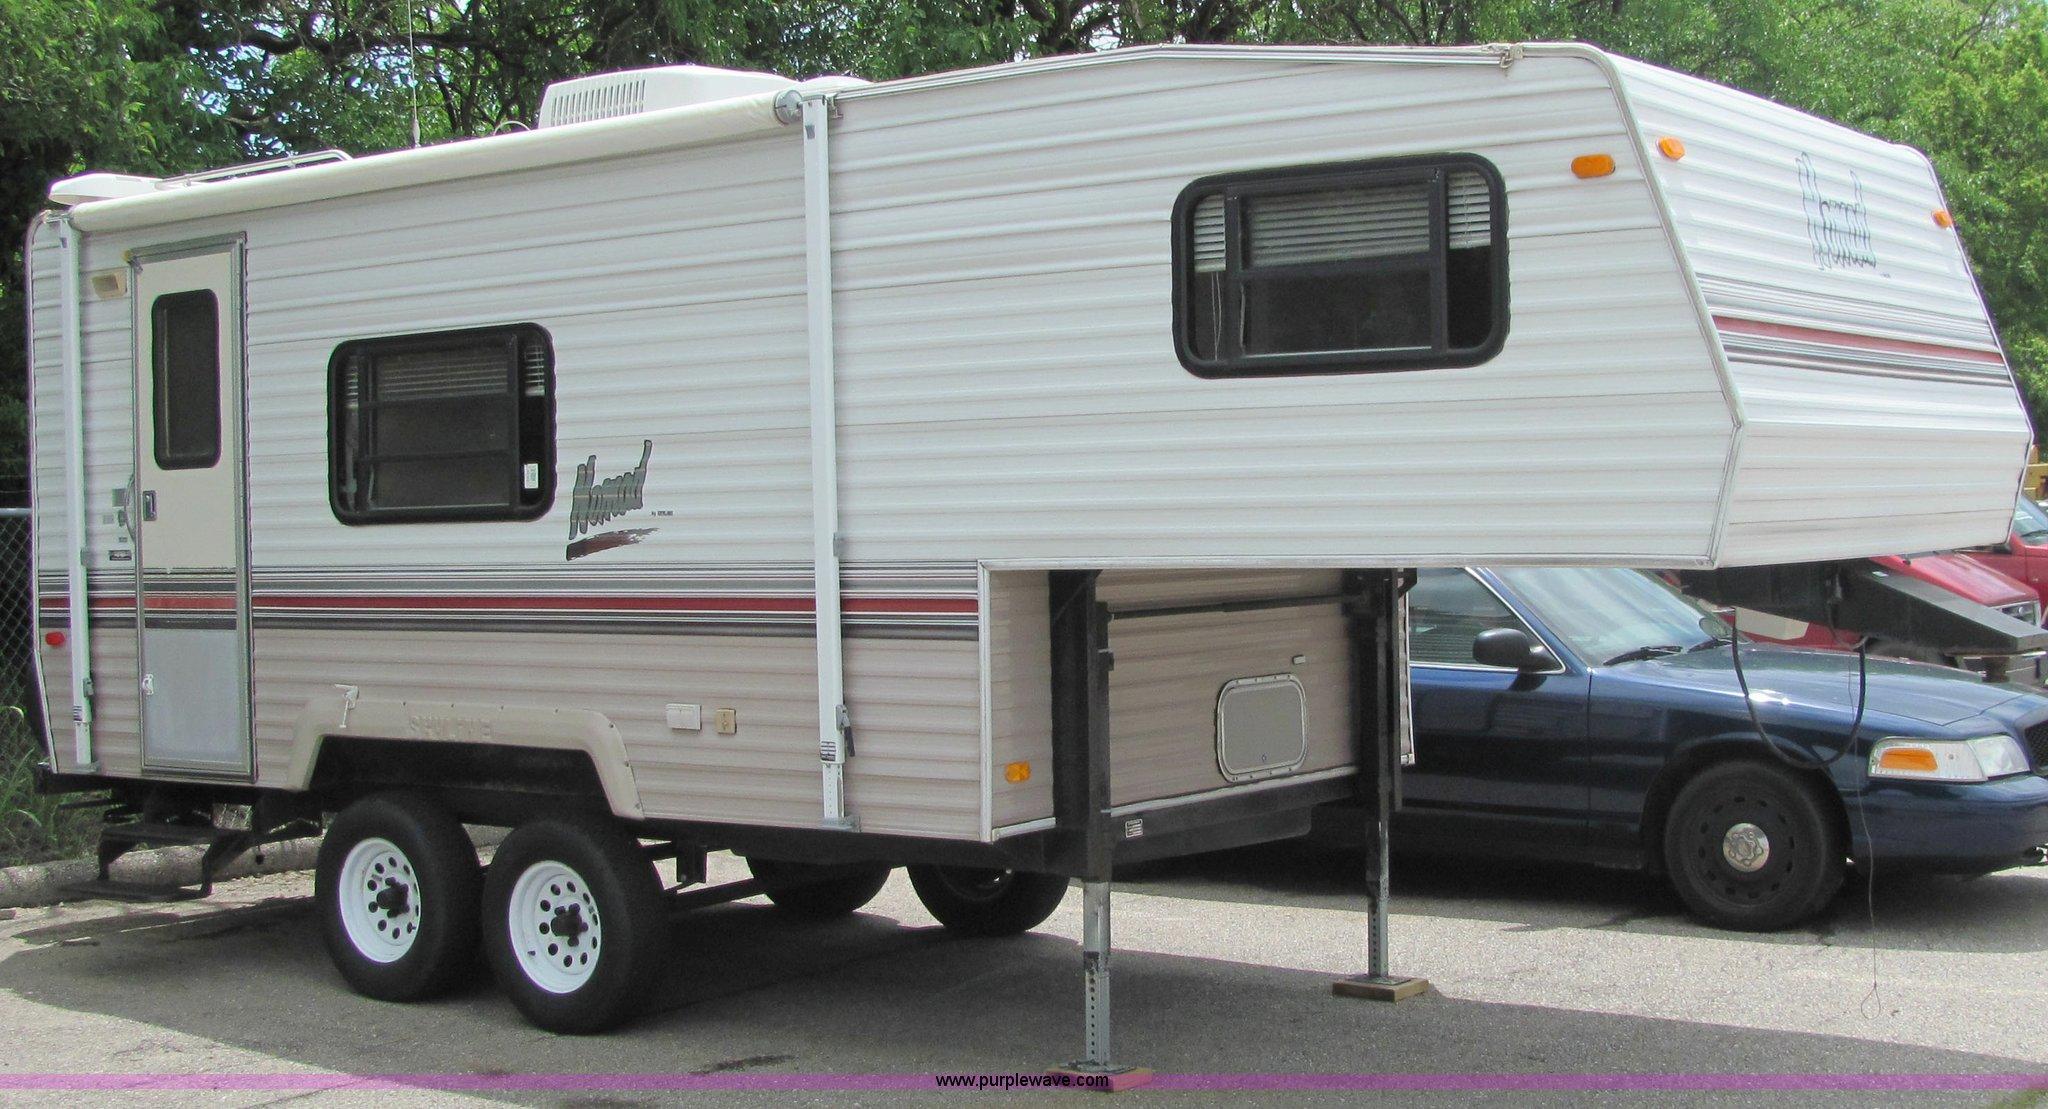 1994 Nomad 21' fifth wheel travel trailer in Derby, KS ...